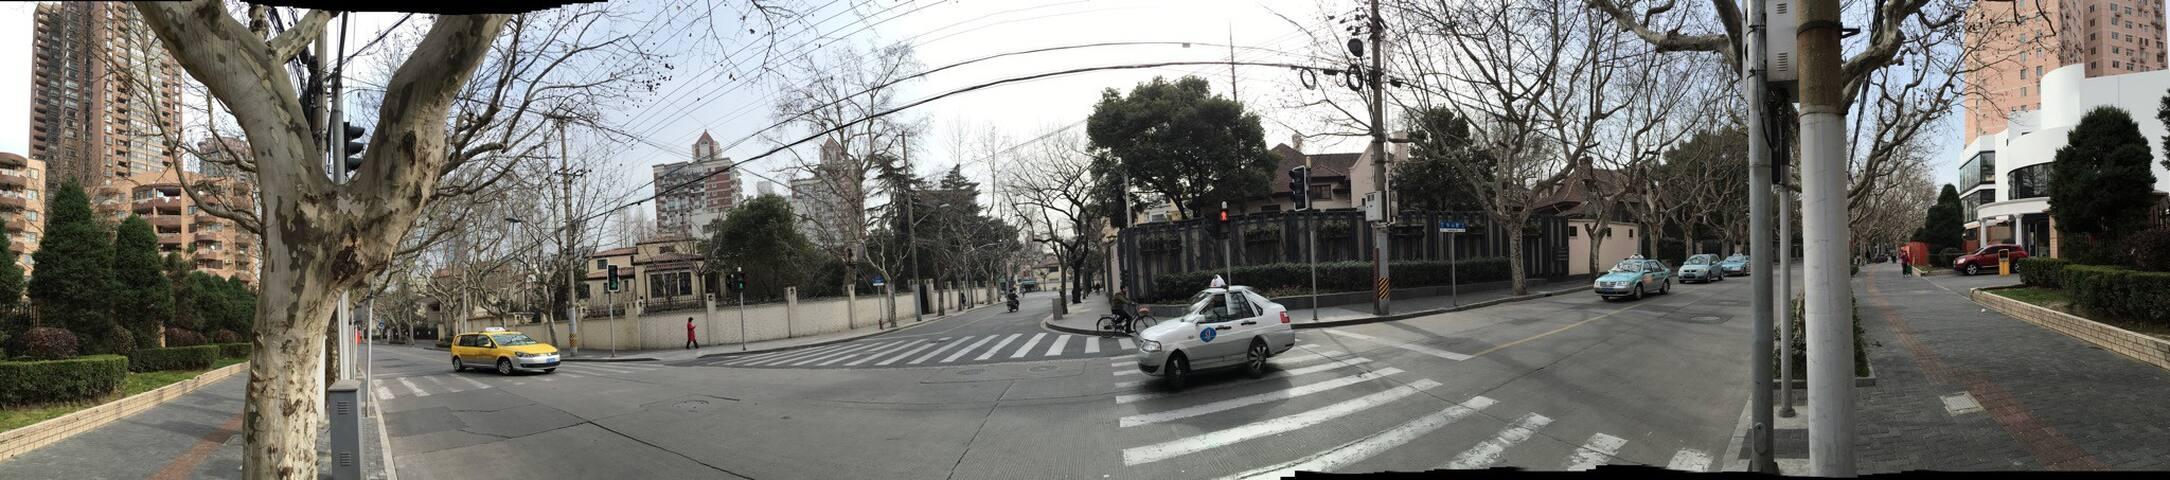 HuaShan street